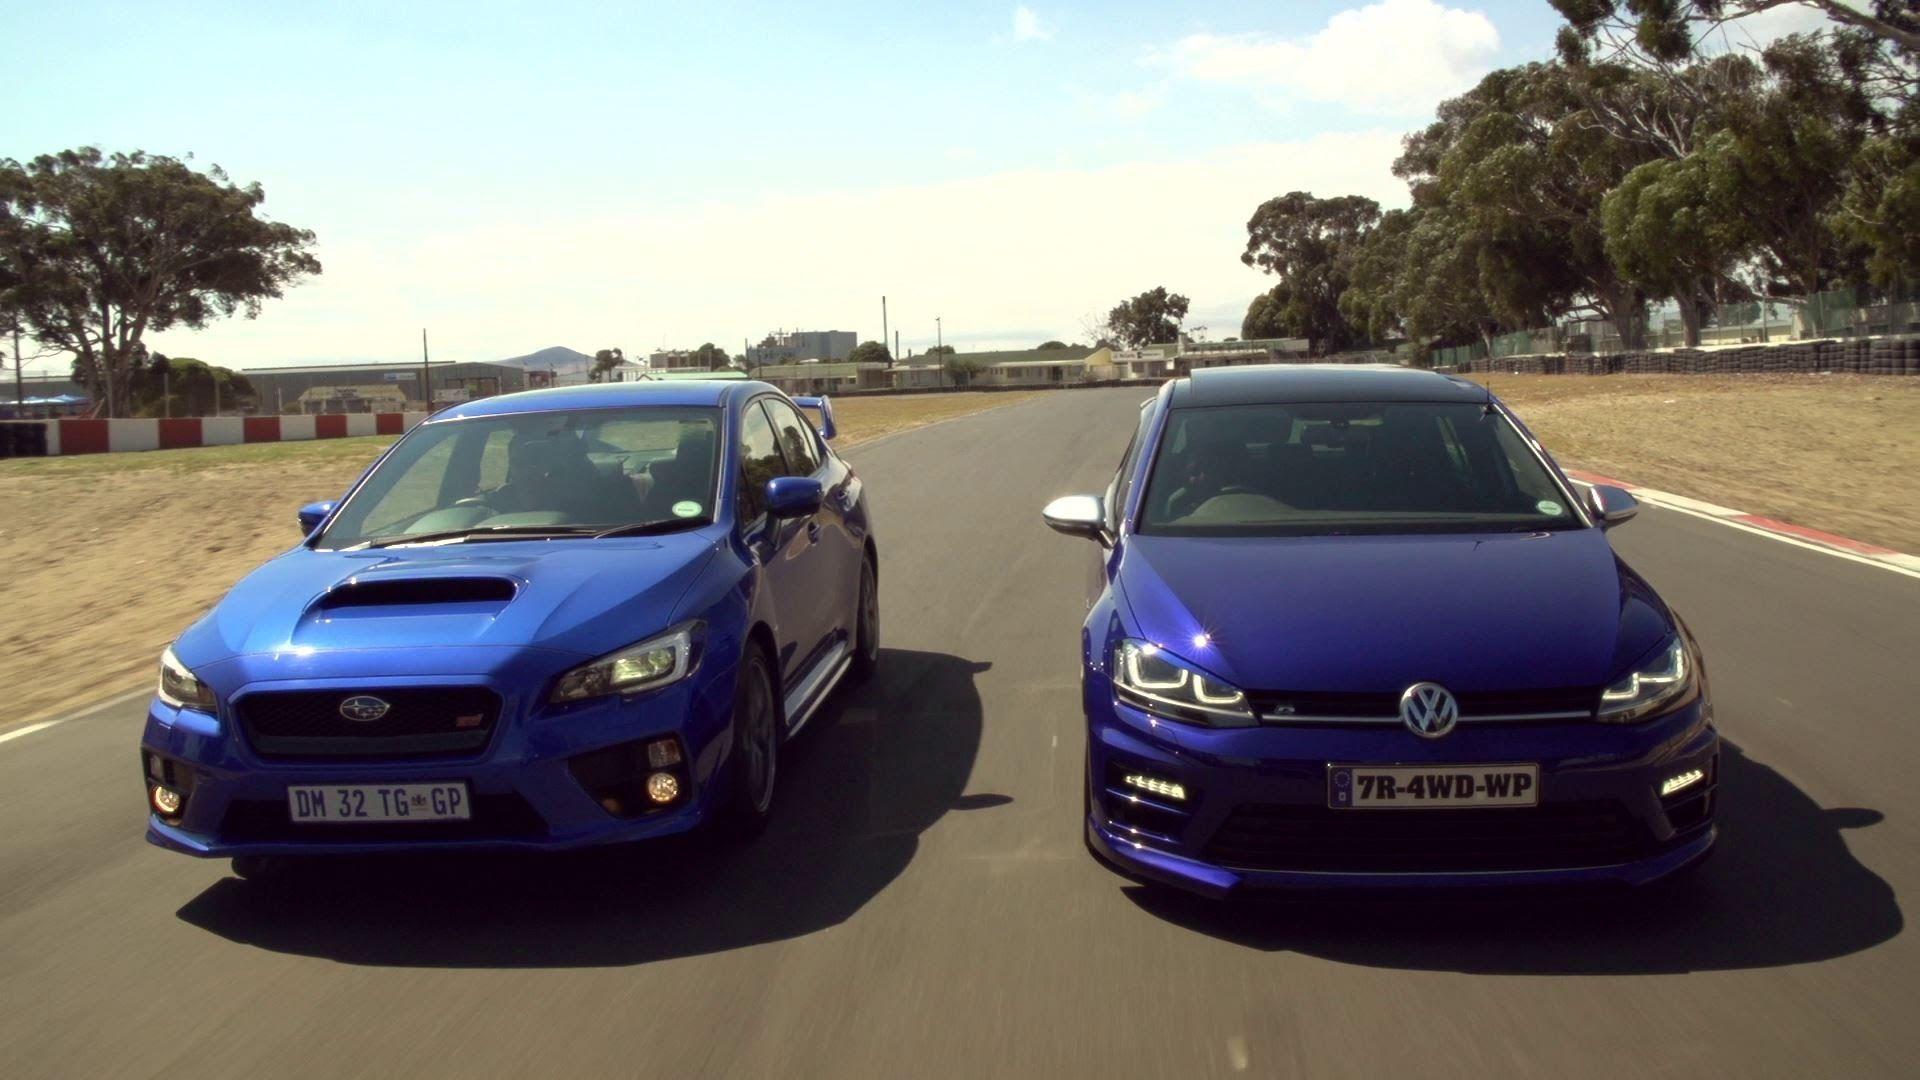 Drag Race Vw Golf 7 R Vs Subaru Sti Subaru Subaru Sti Subaru Wrx Sti